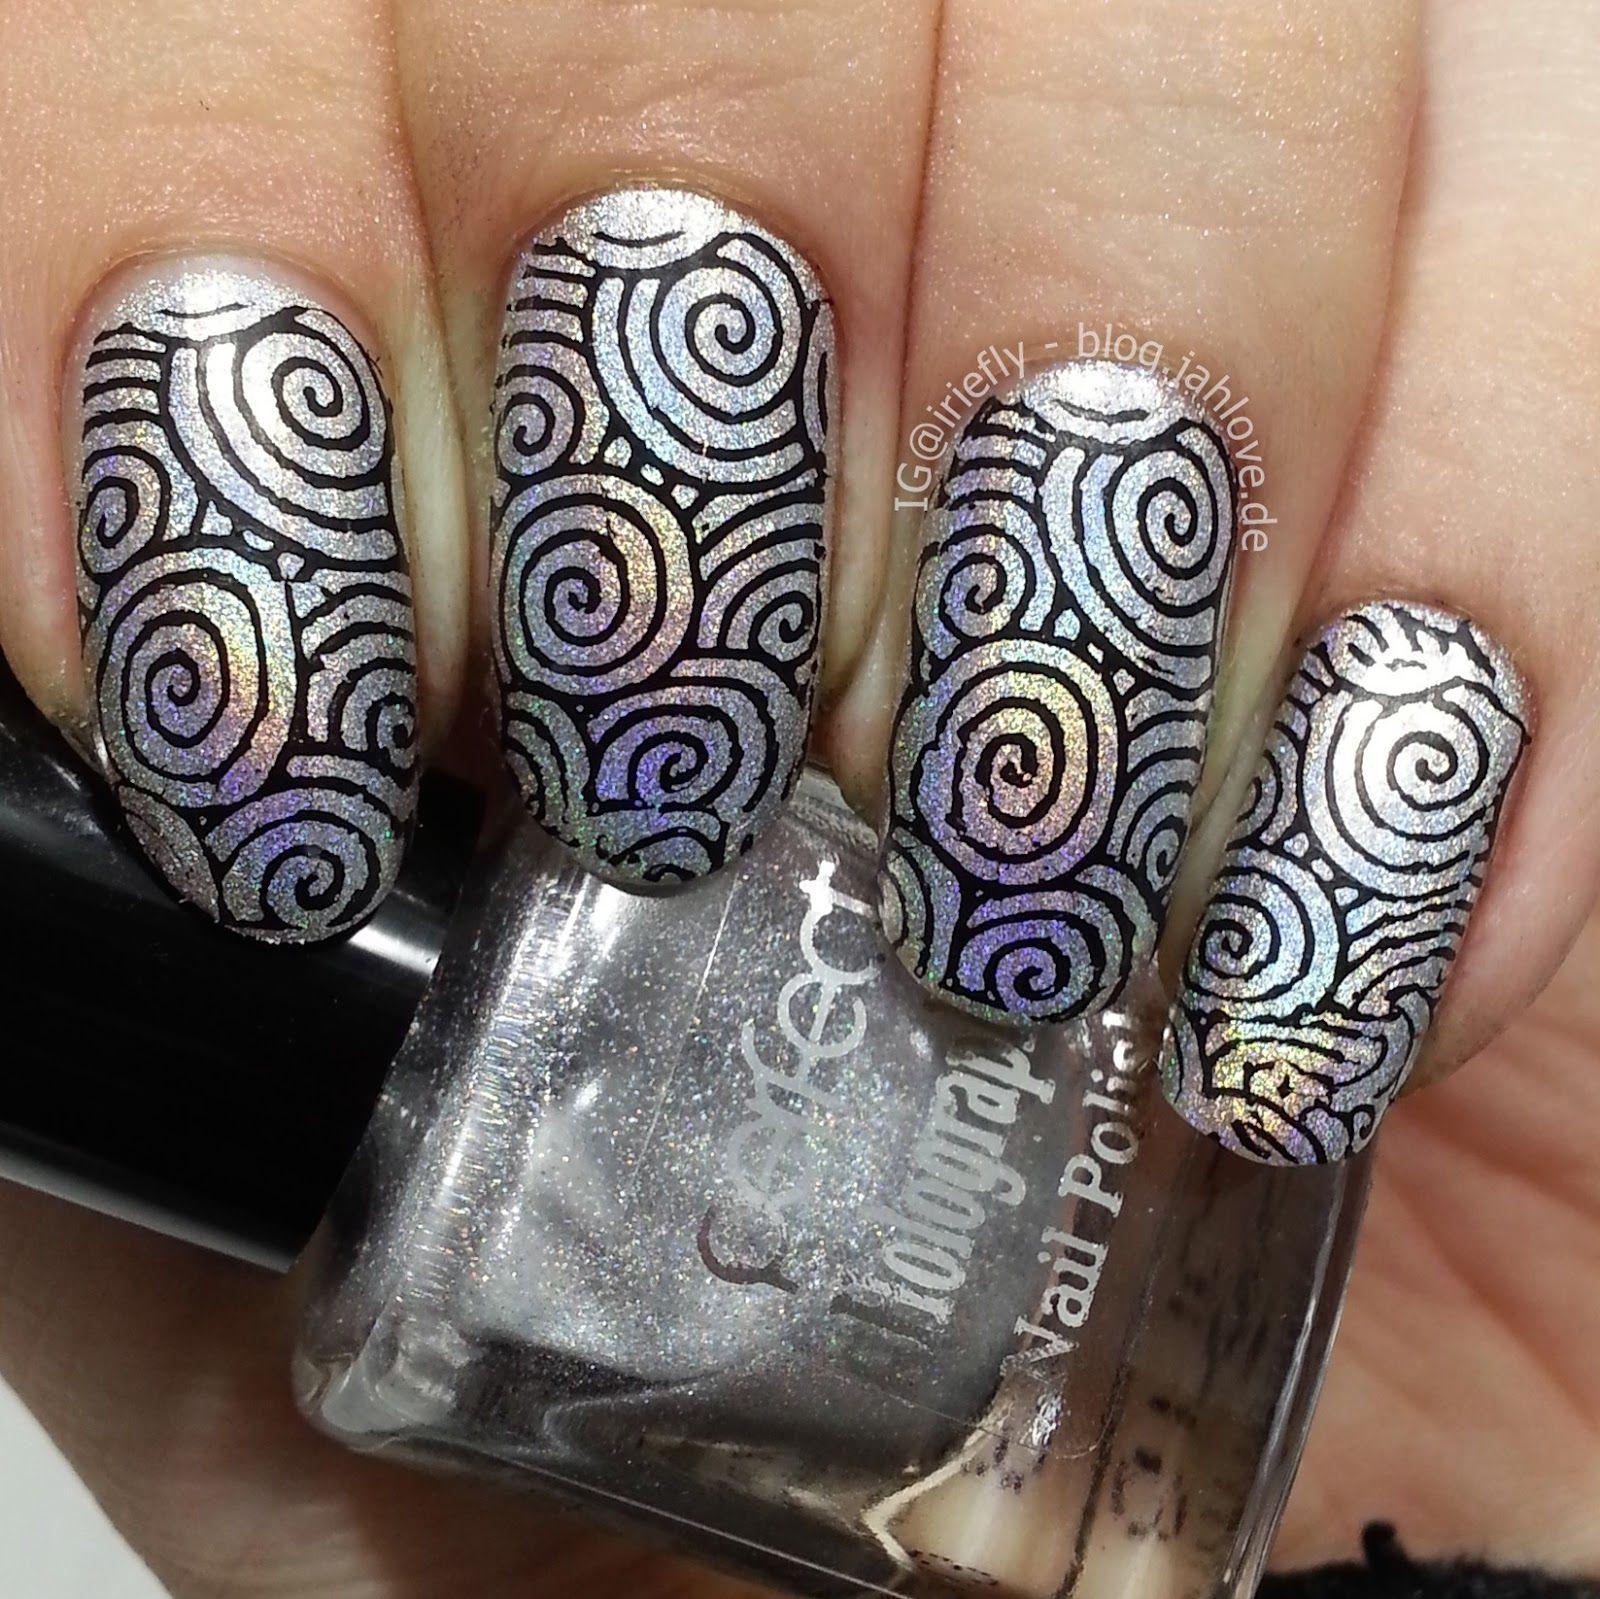 ".:: blog.jahlove.de ::.: [Nails] Holo-Stamping mit Perfect Holographic Nail Polish ""H2"""